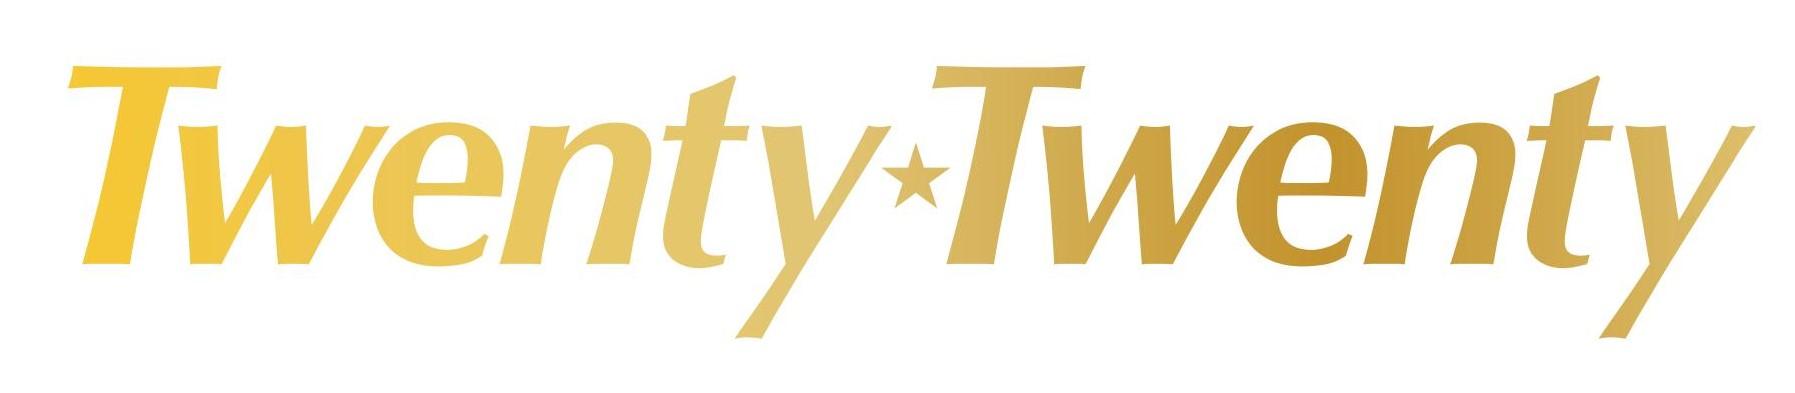 twentytwenty_ロゴ